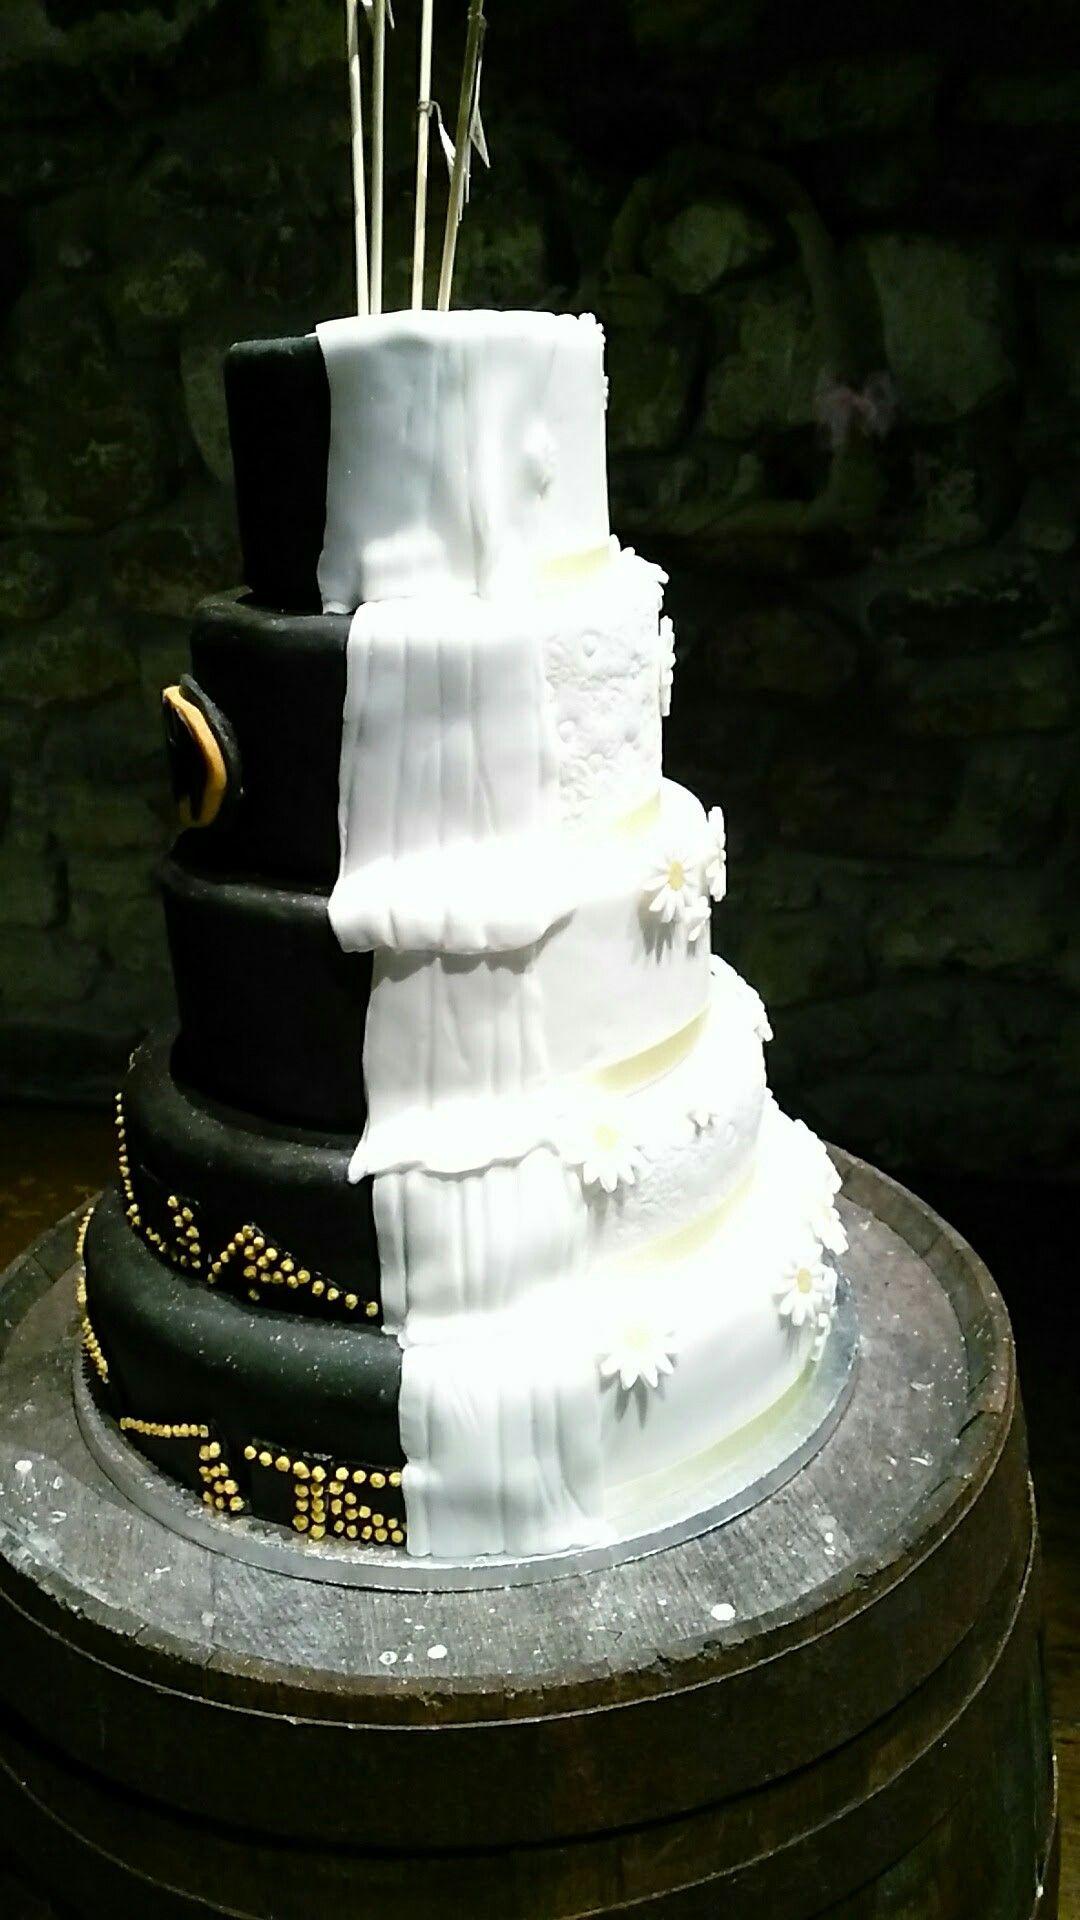 Pin by Wursty on Daisy/Batman themed wedding cake | Pinterest ...